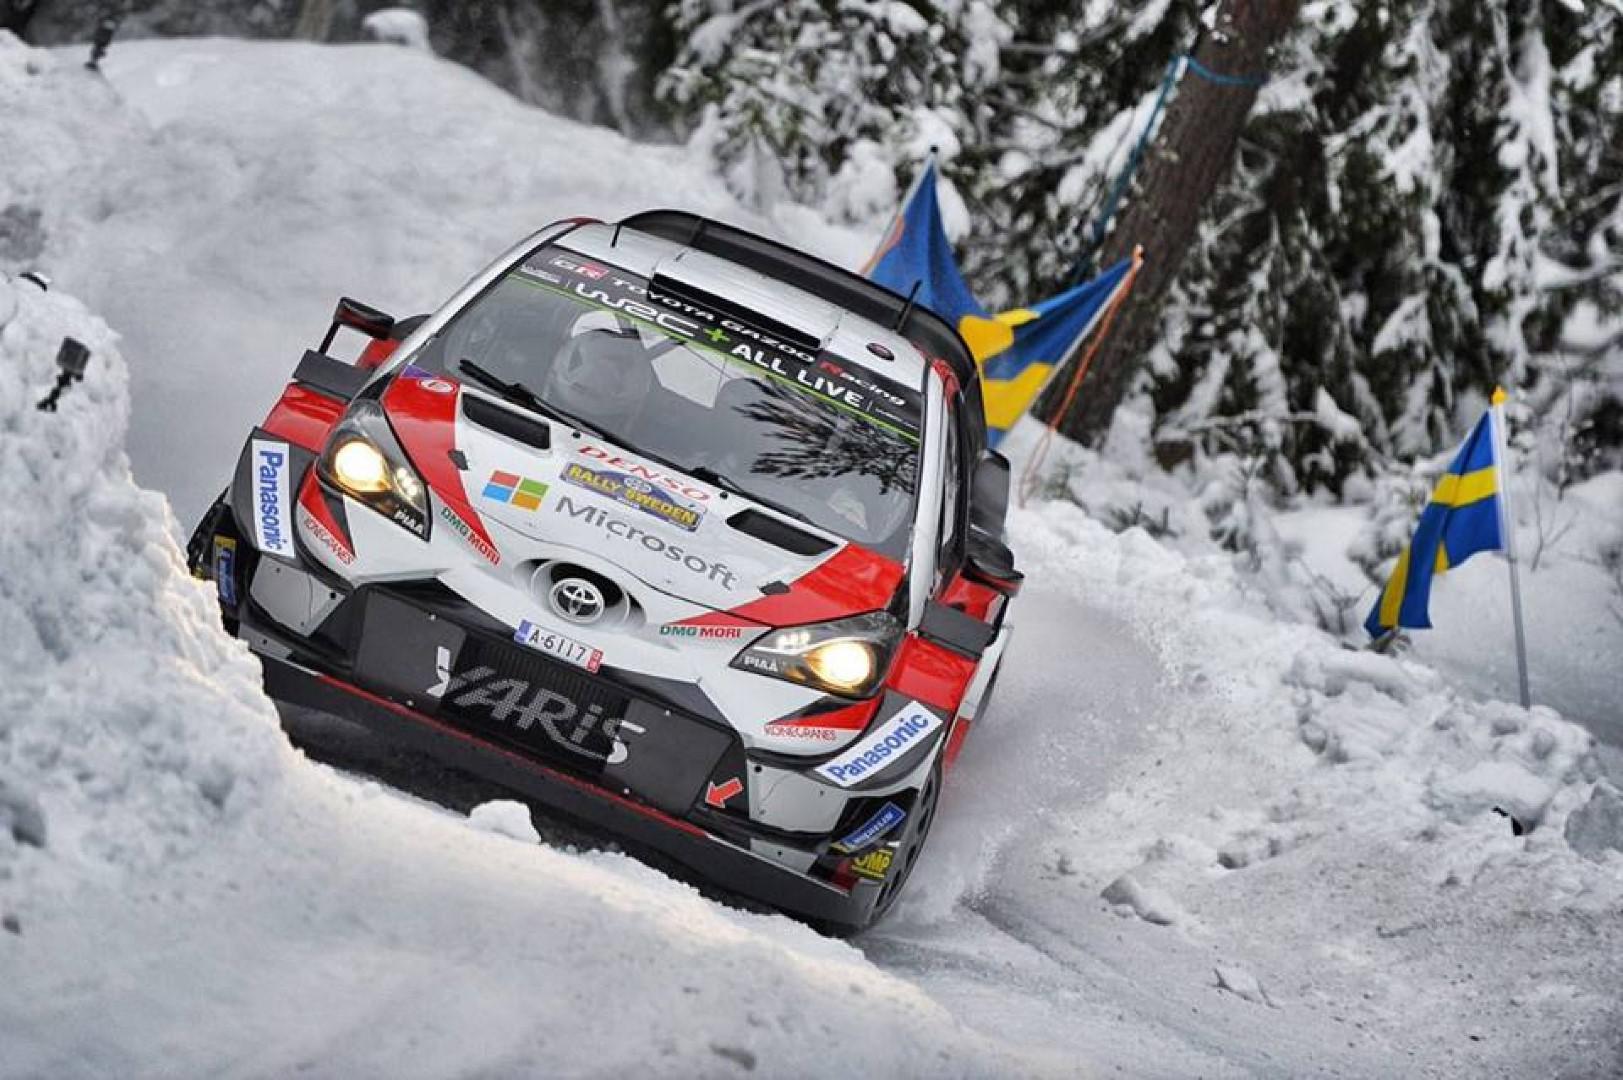 Rallye de Suède 2018 : Ott Tanak prend le commandement